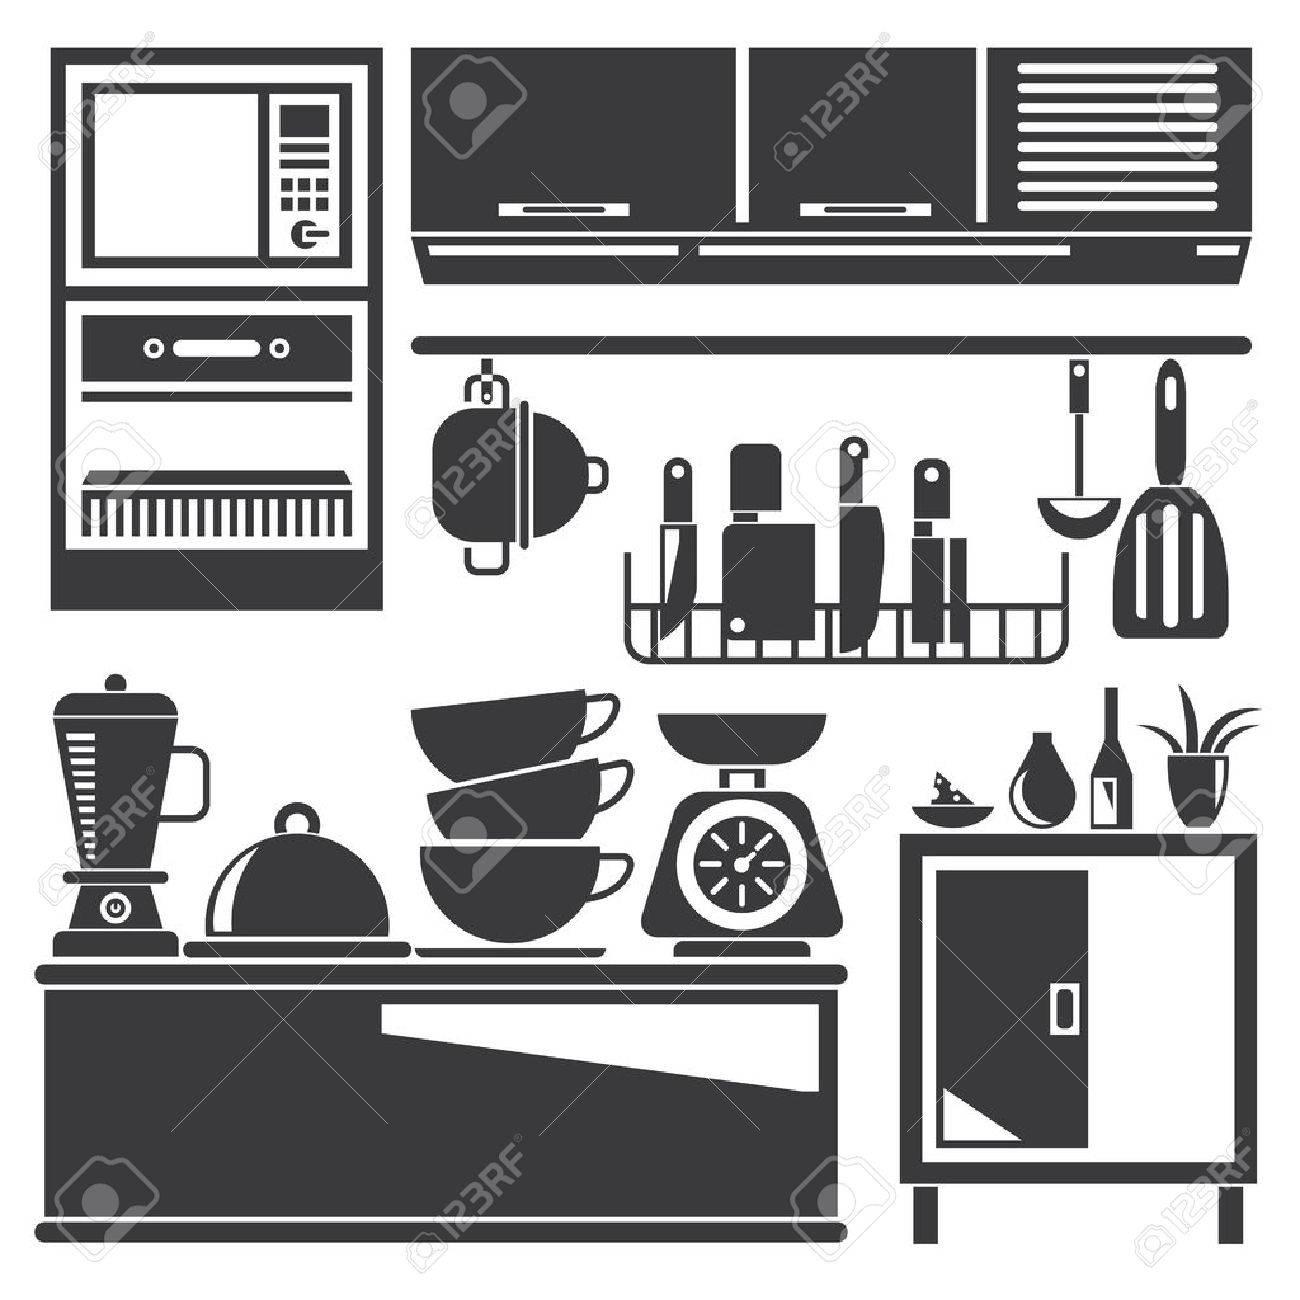 kitchen appliances - 53039129